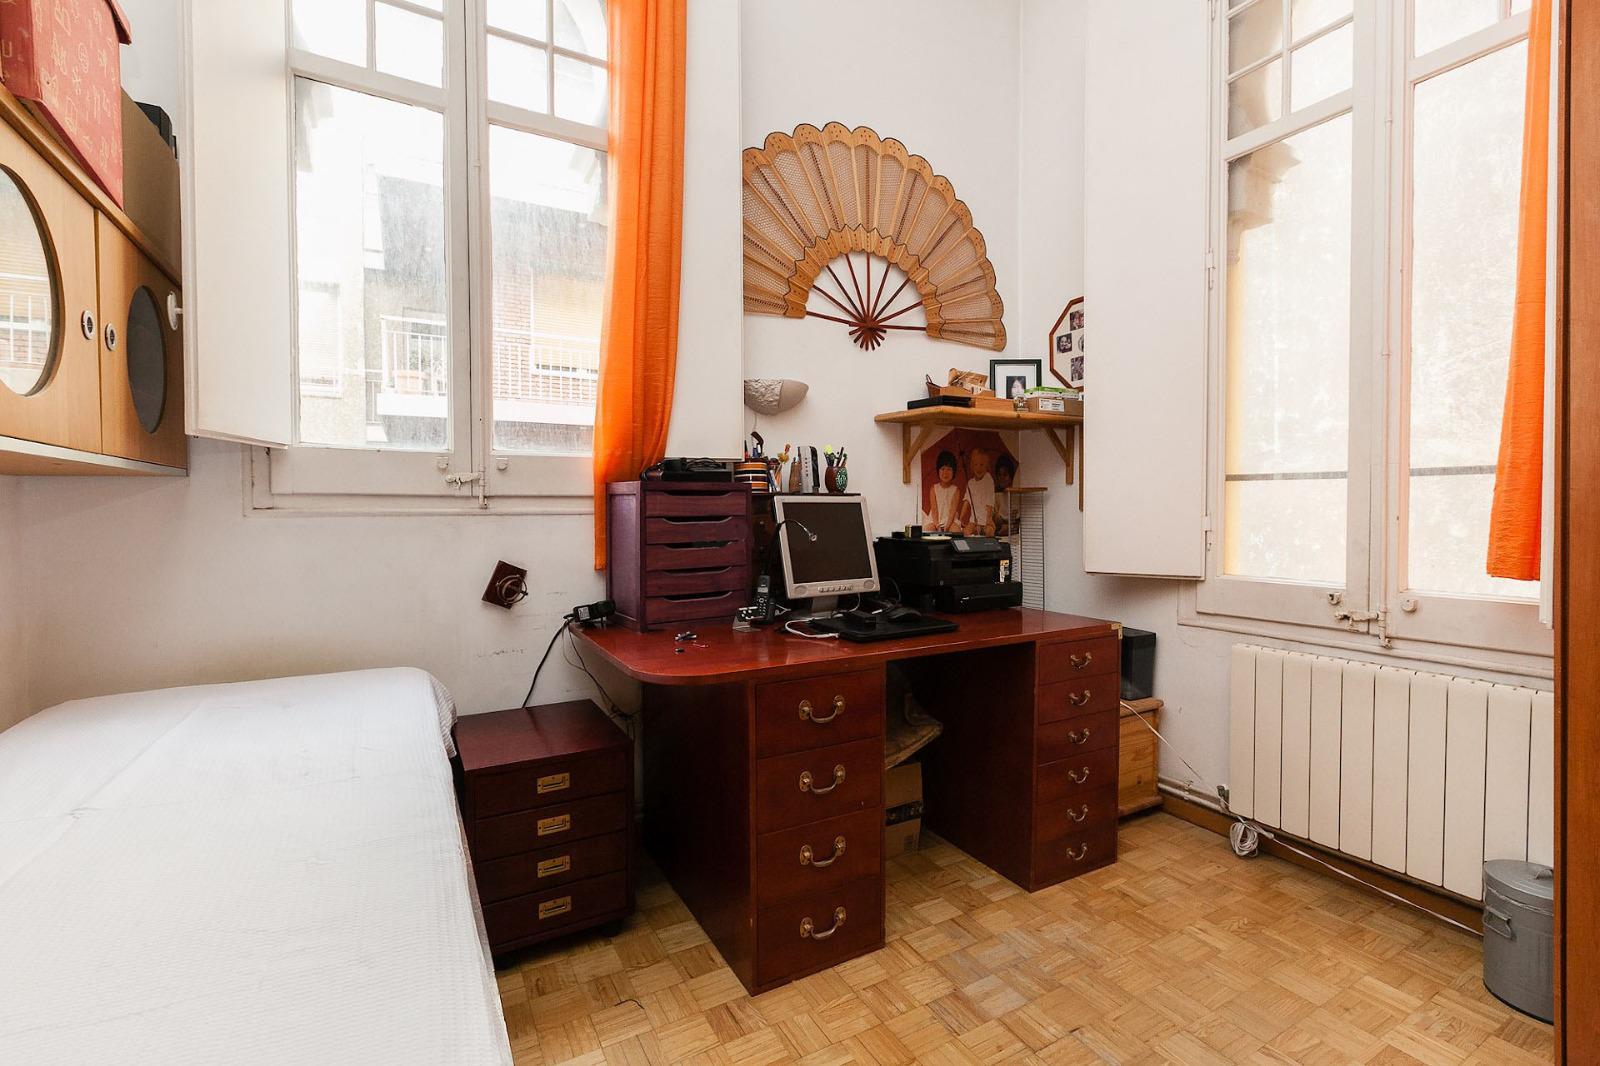 247916 Flat for sale in Sarrià-Sant Gervasi, Sant Gervasi-Galvany 18